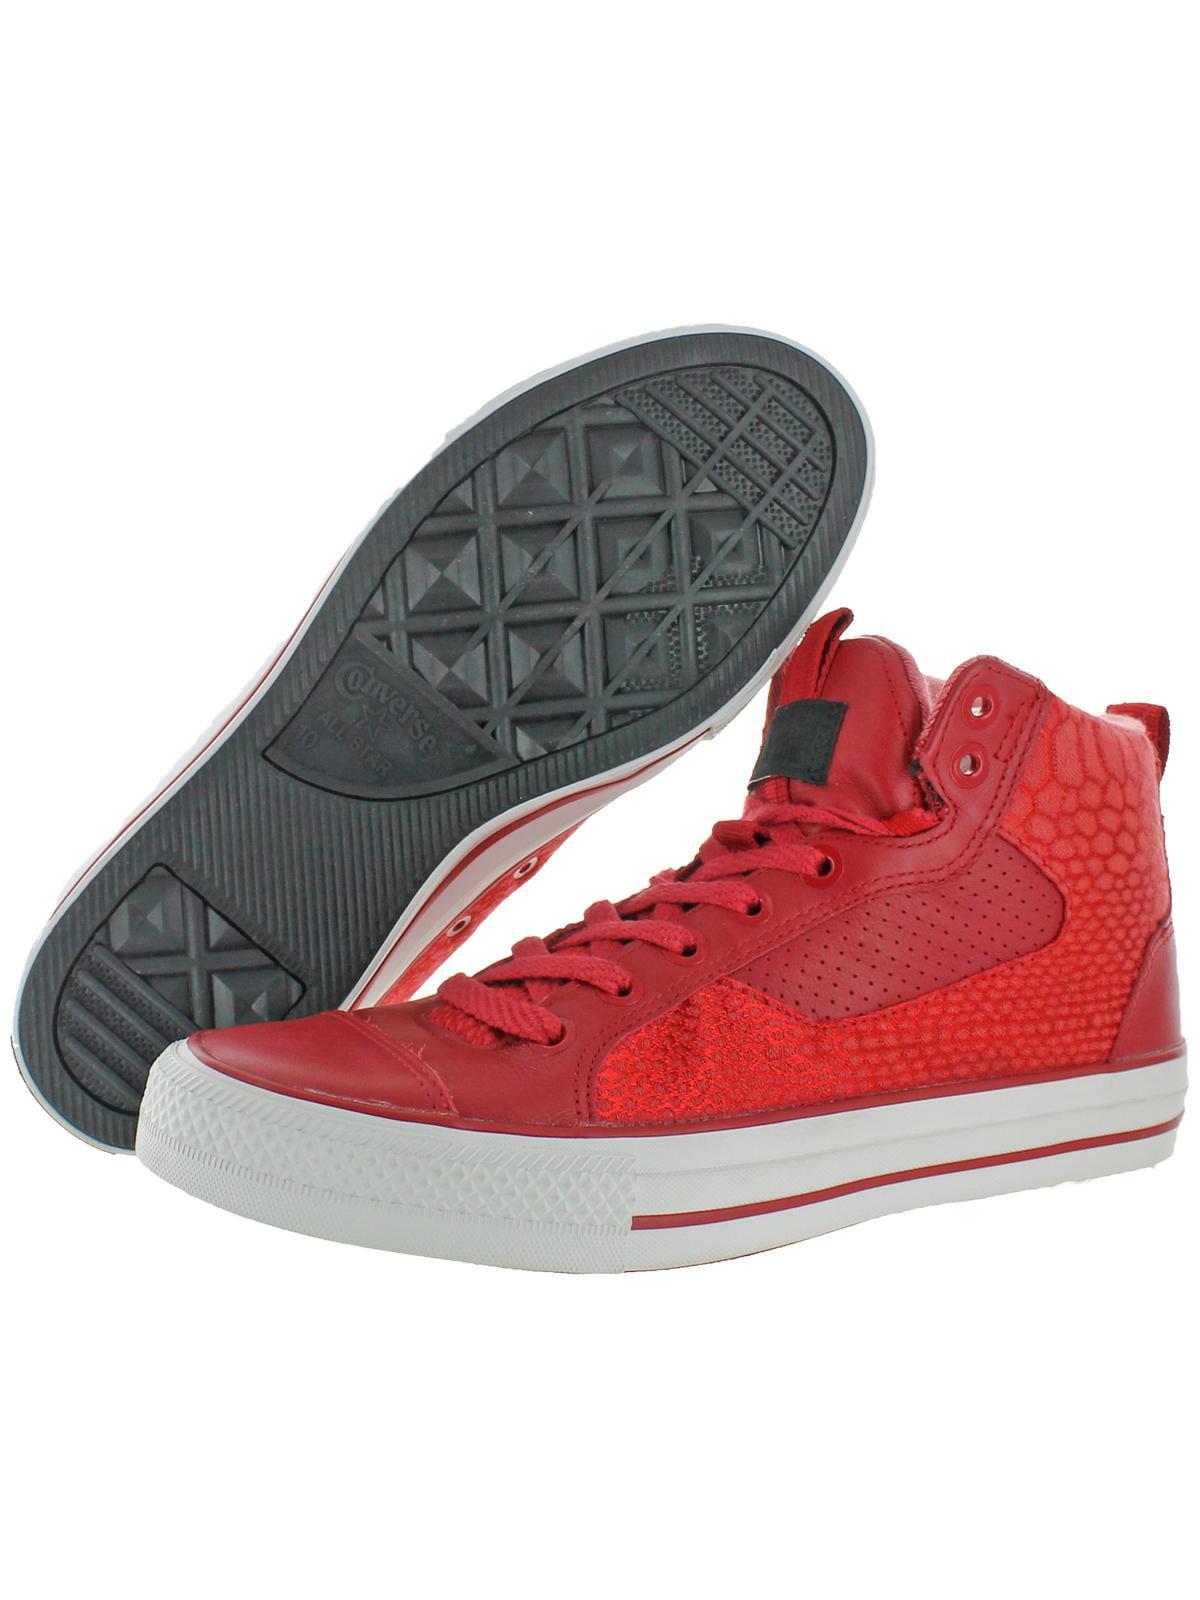 Converse Mens Chuck Taylor Asylum Mid Mid Fashion Skate Shoes Red 10 Medium (D)